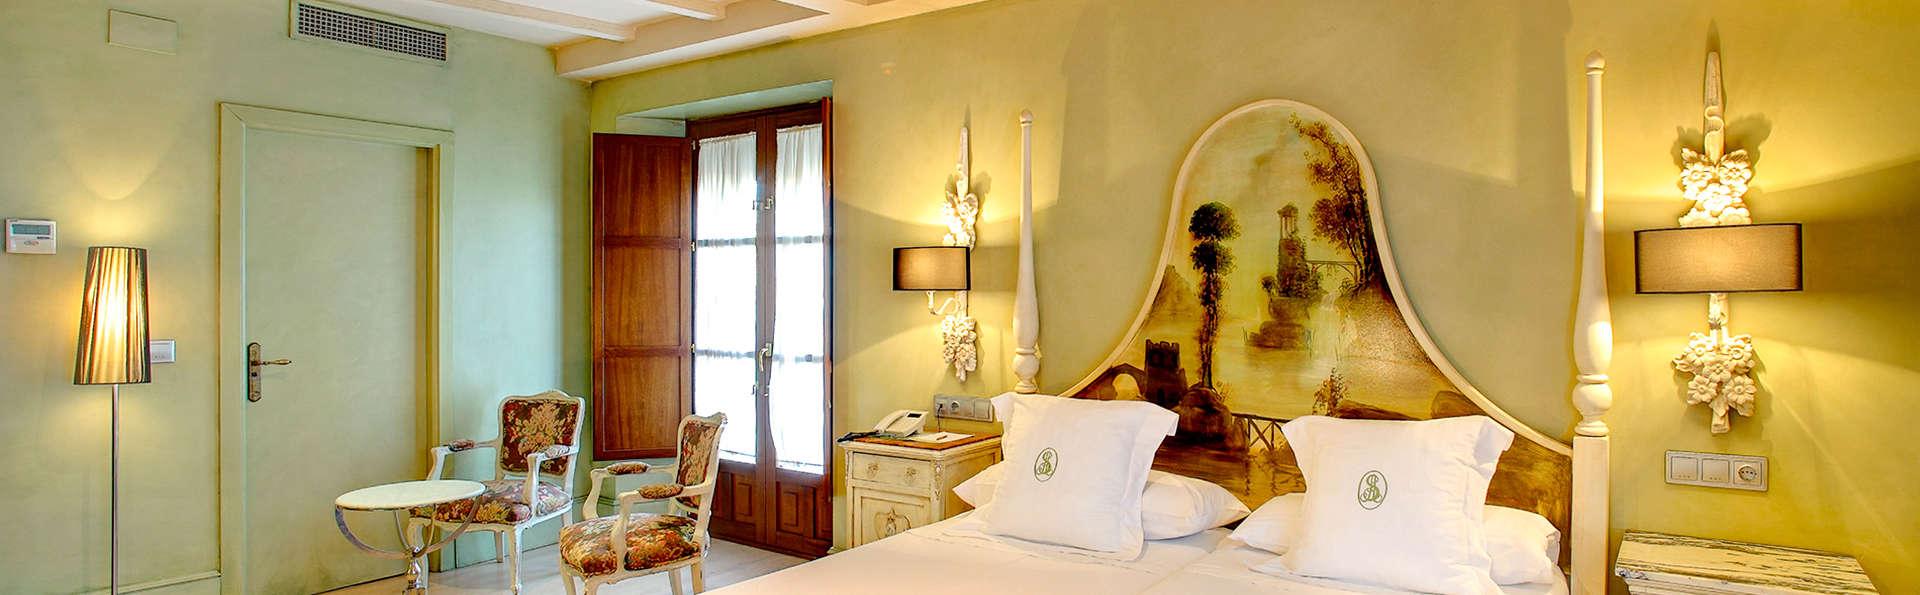 Hotel Sacristía de Santa Ana - Edit_Room4.jpg